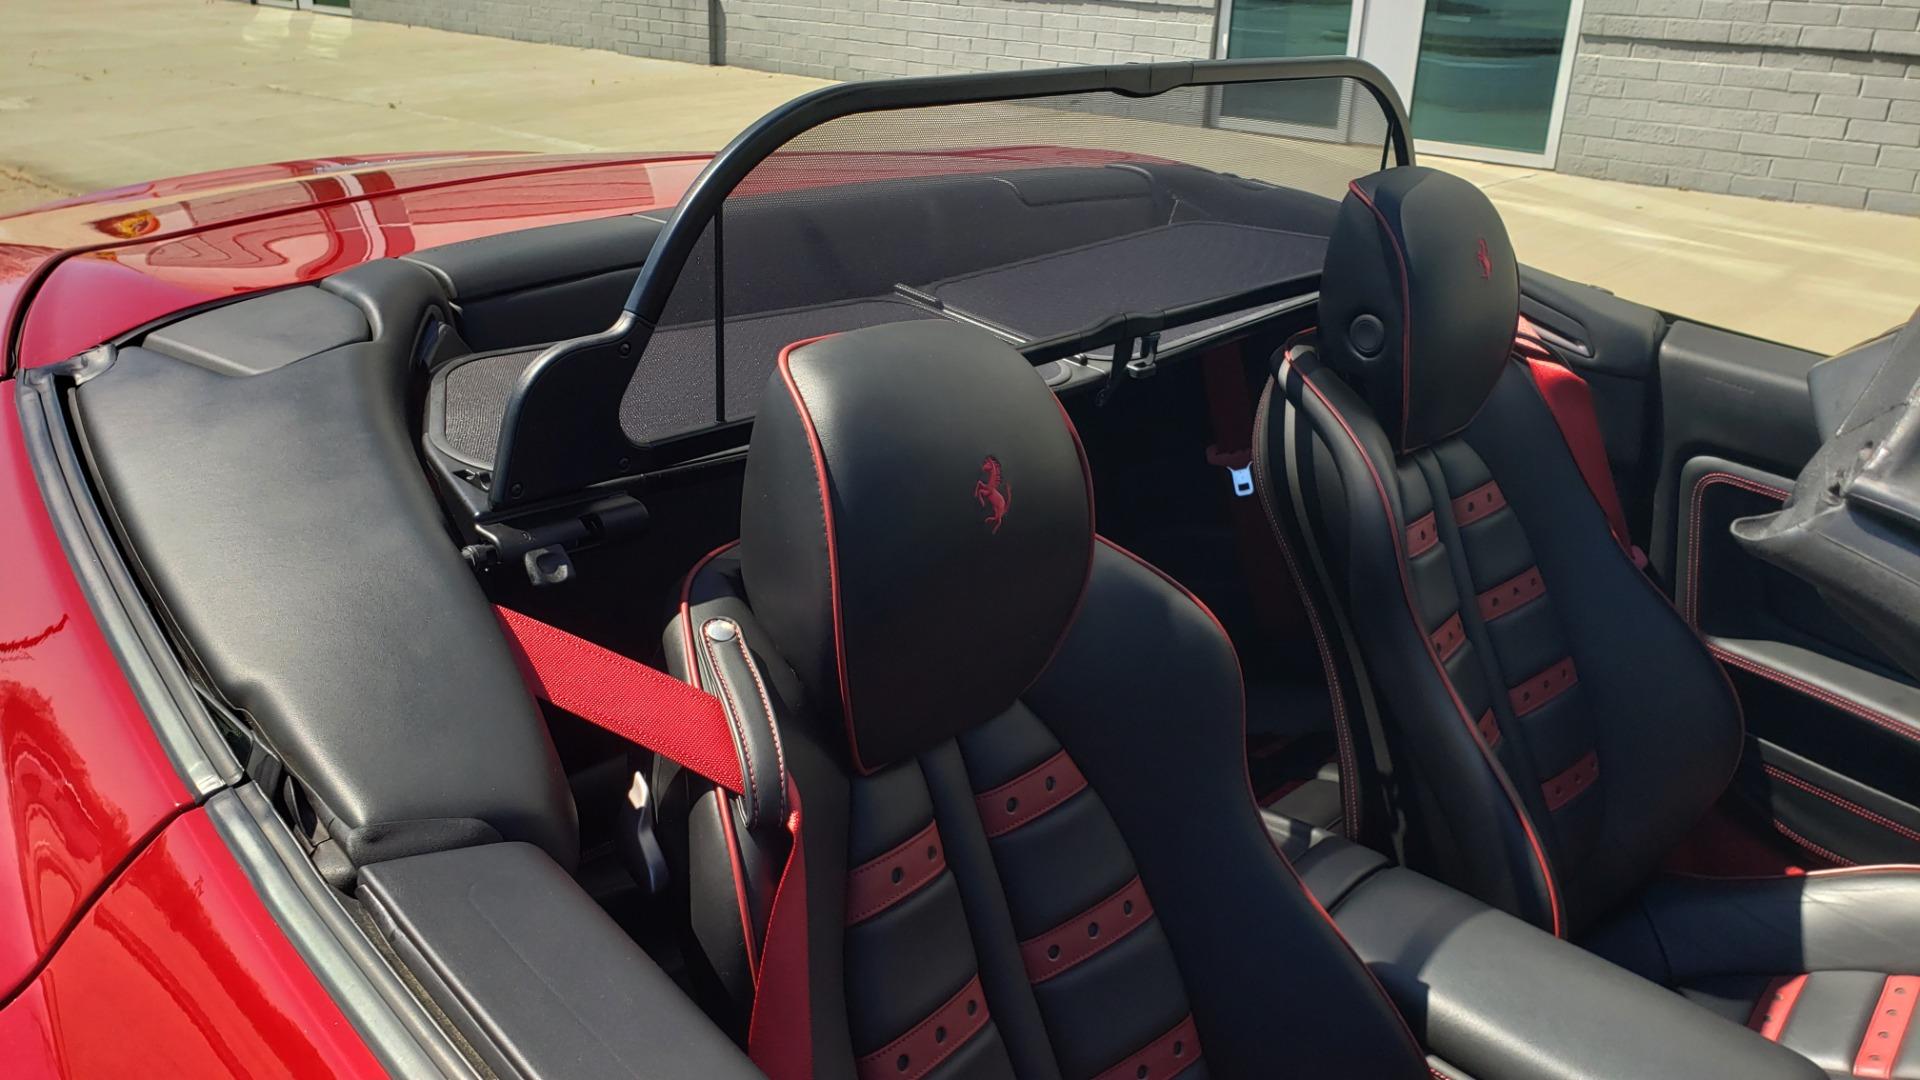 Used 2014 Ferrari CALIFORNIA CONVERTIBLE 2+2 / NAV / PARK SENS / CAMERA / TPMS for sale Sold at Formula Imports in Charlotte NC 28227 53